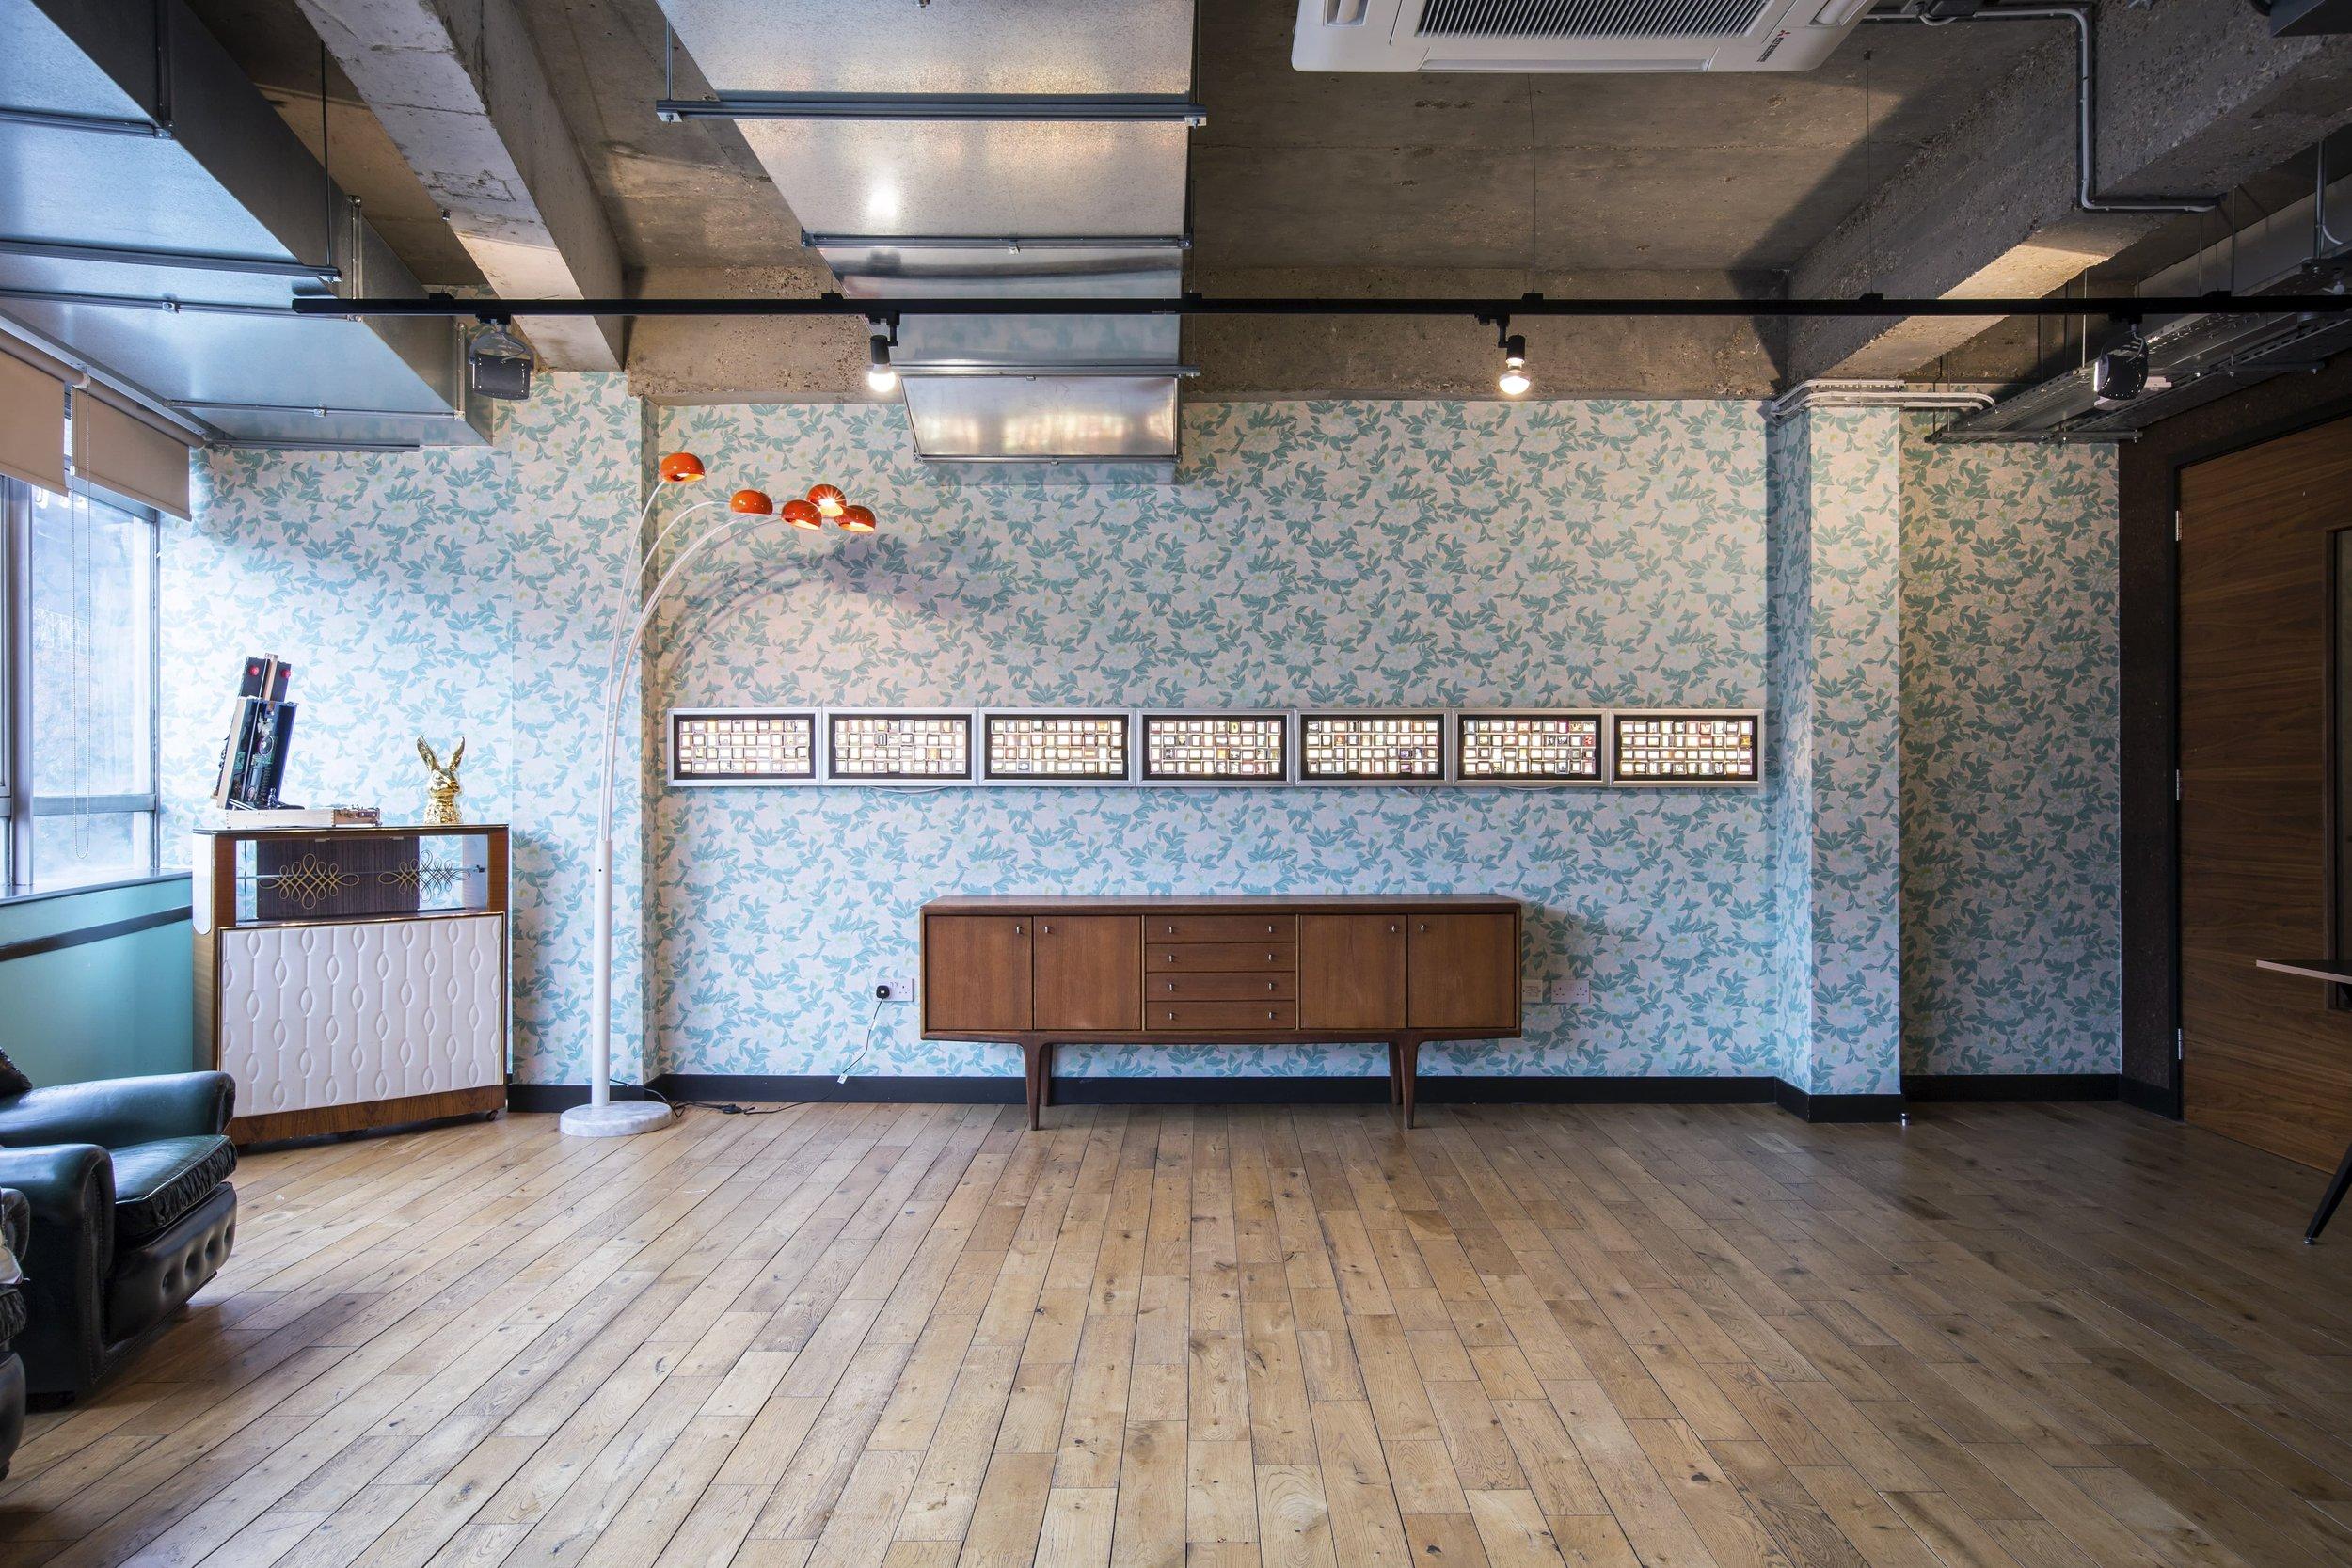 Theo Tzia Photography - Interior:Commercial Workplaces Portfolio - 9.jpg